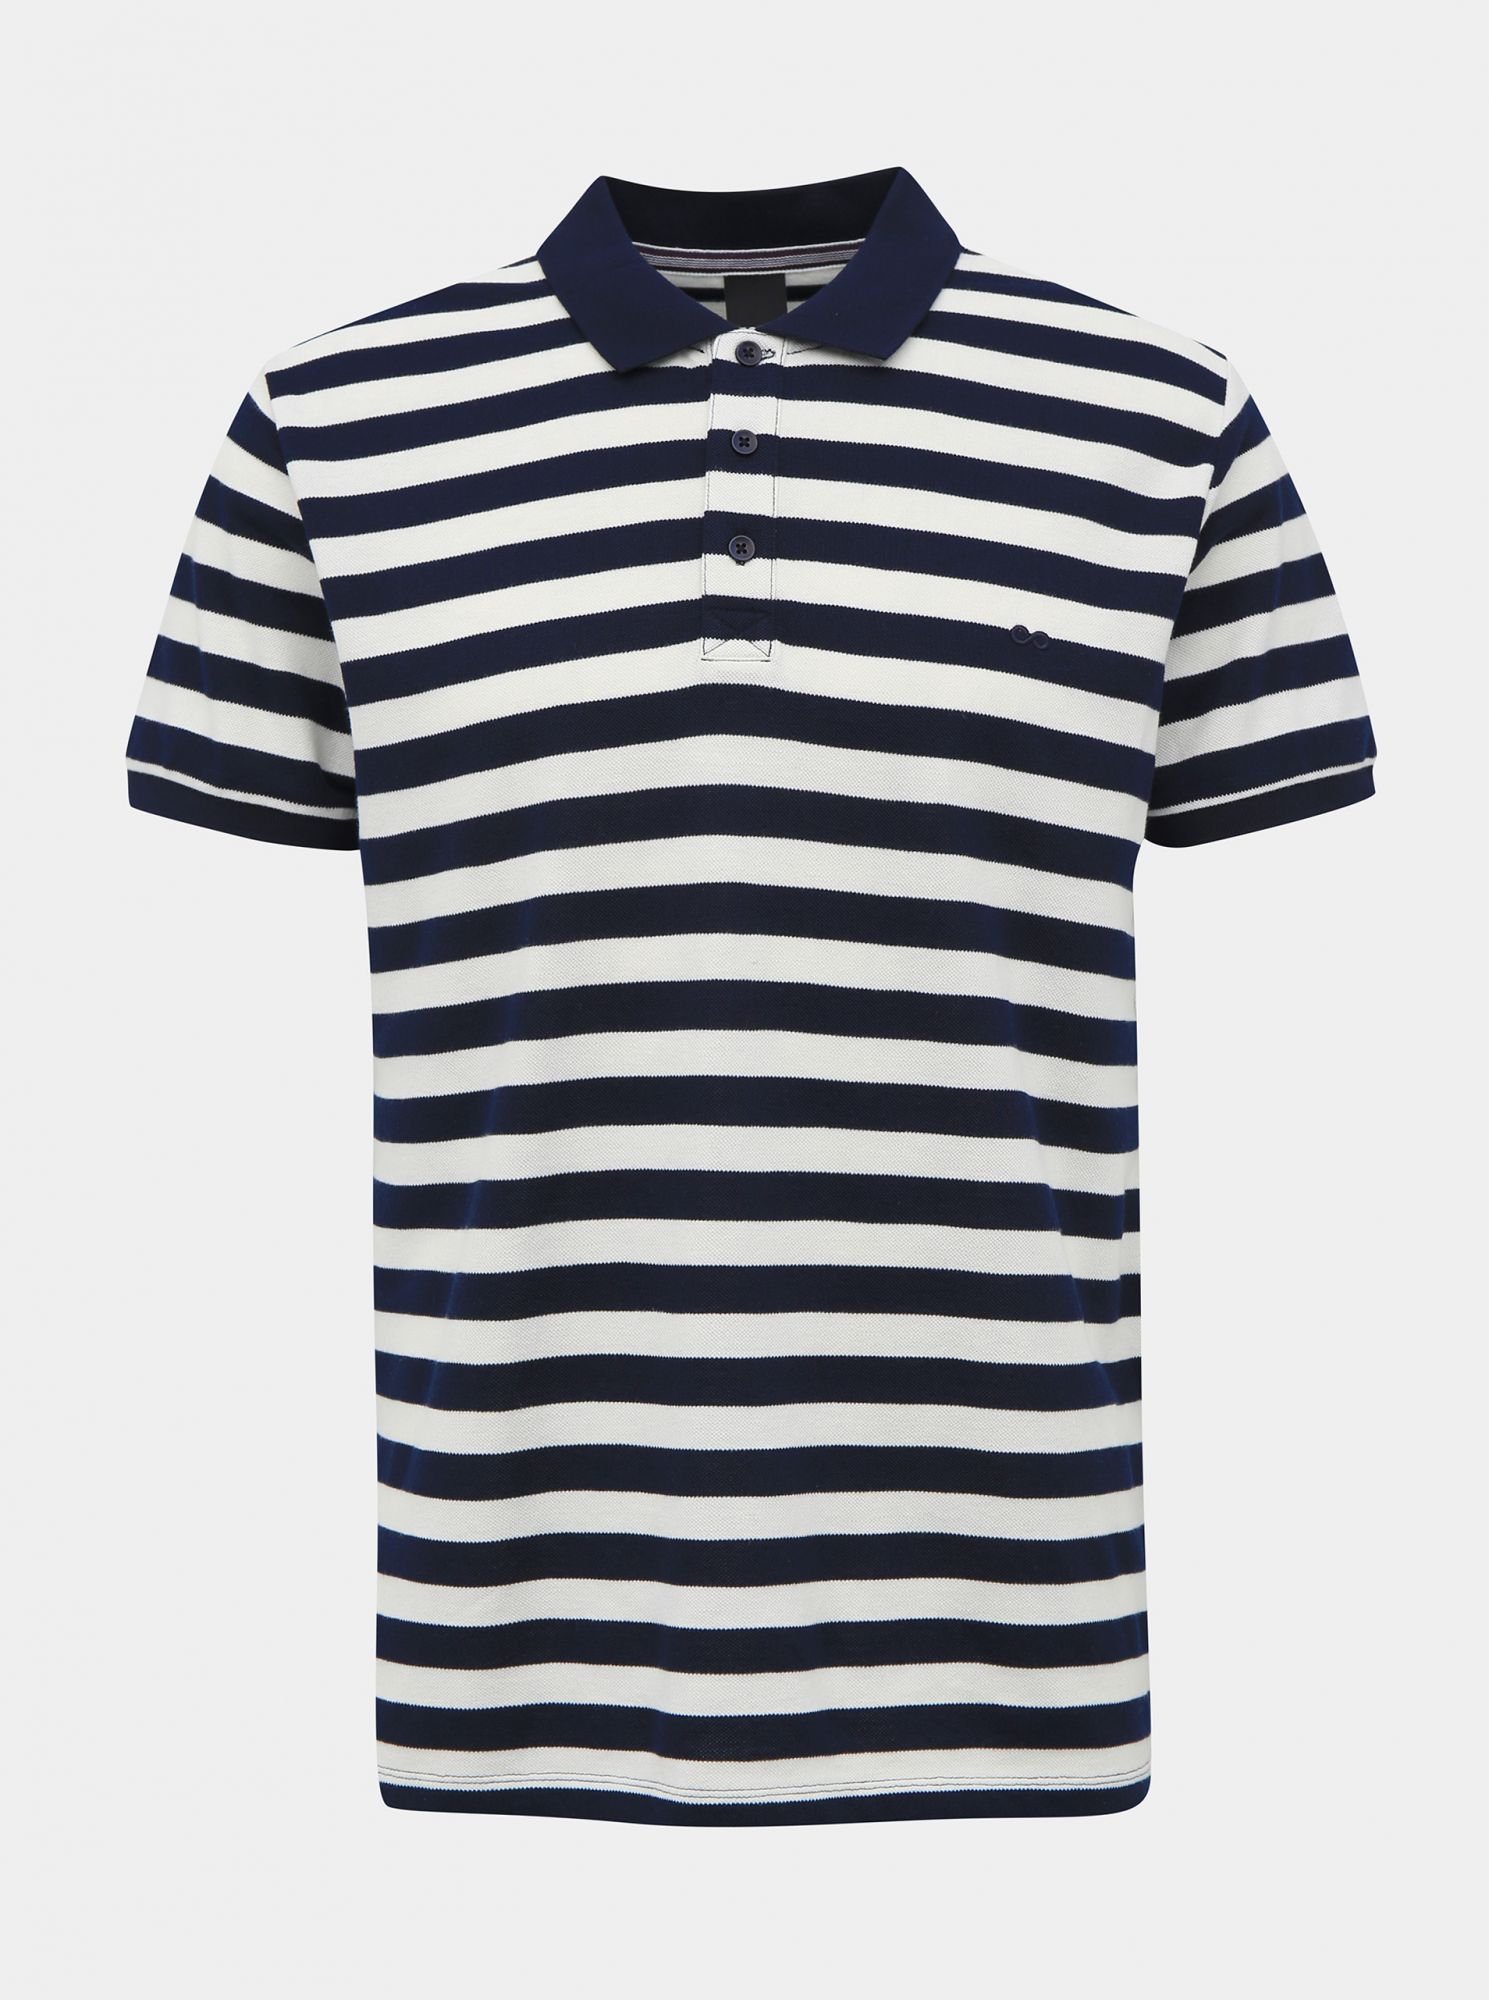 ZOOT bílo-modré basic polo pánské tričko Lucas